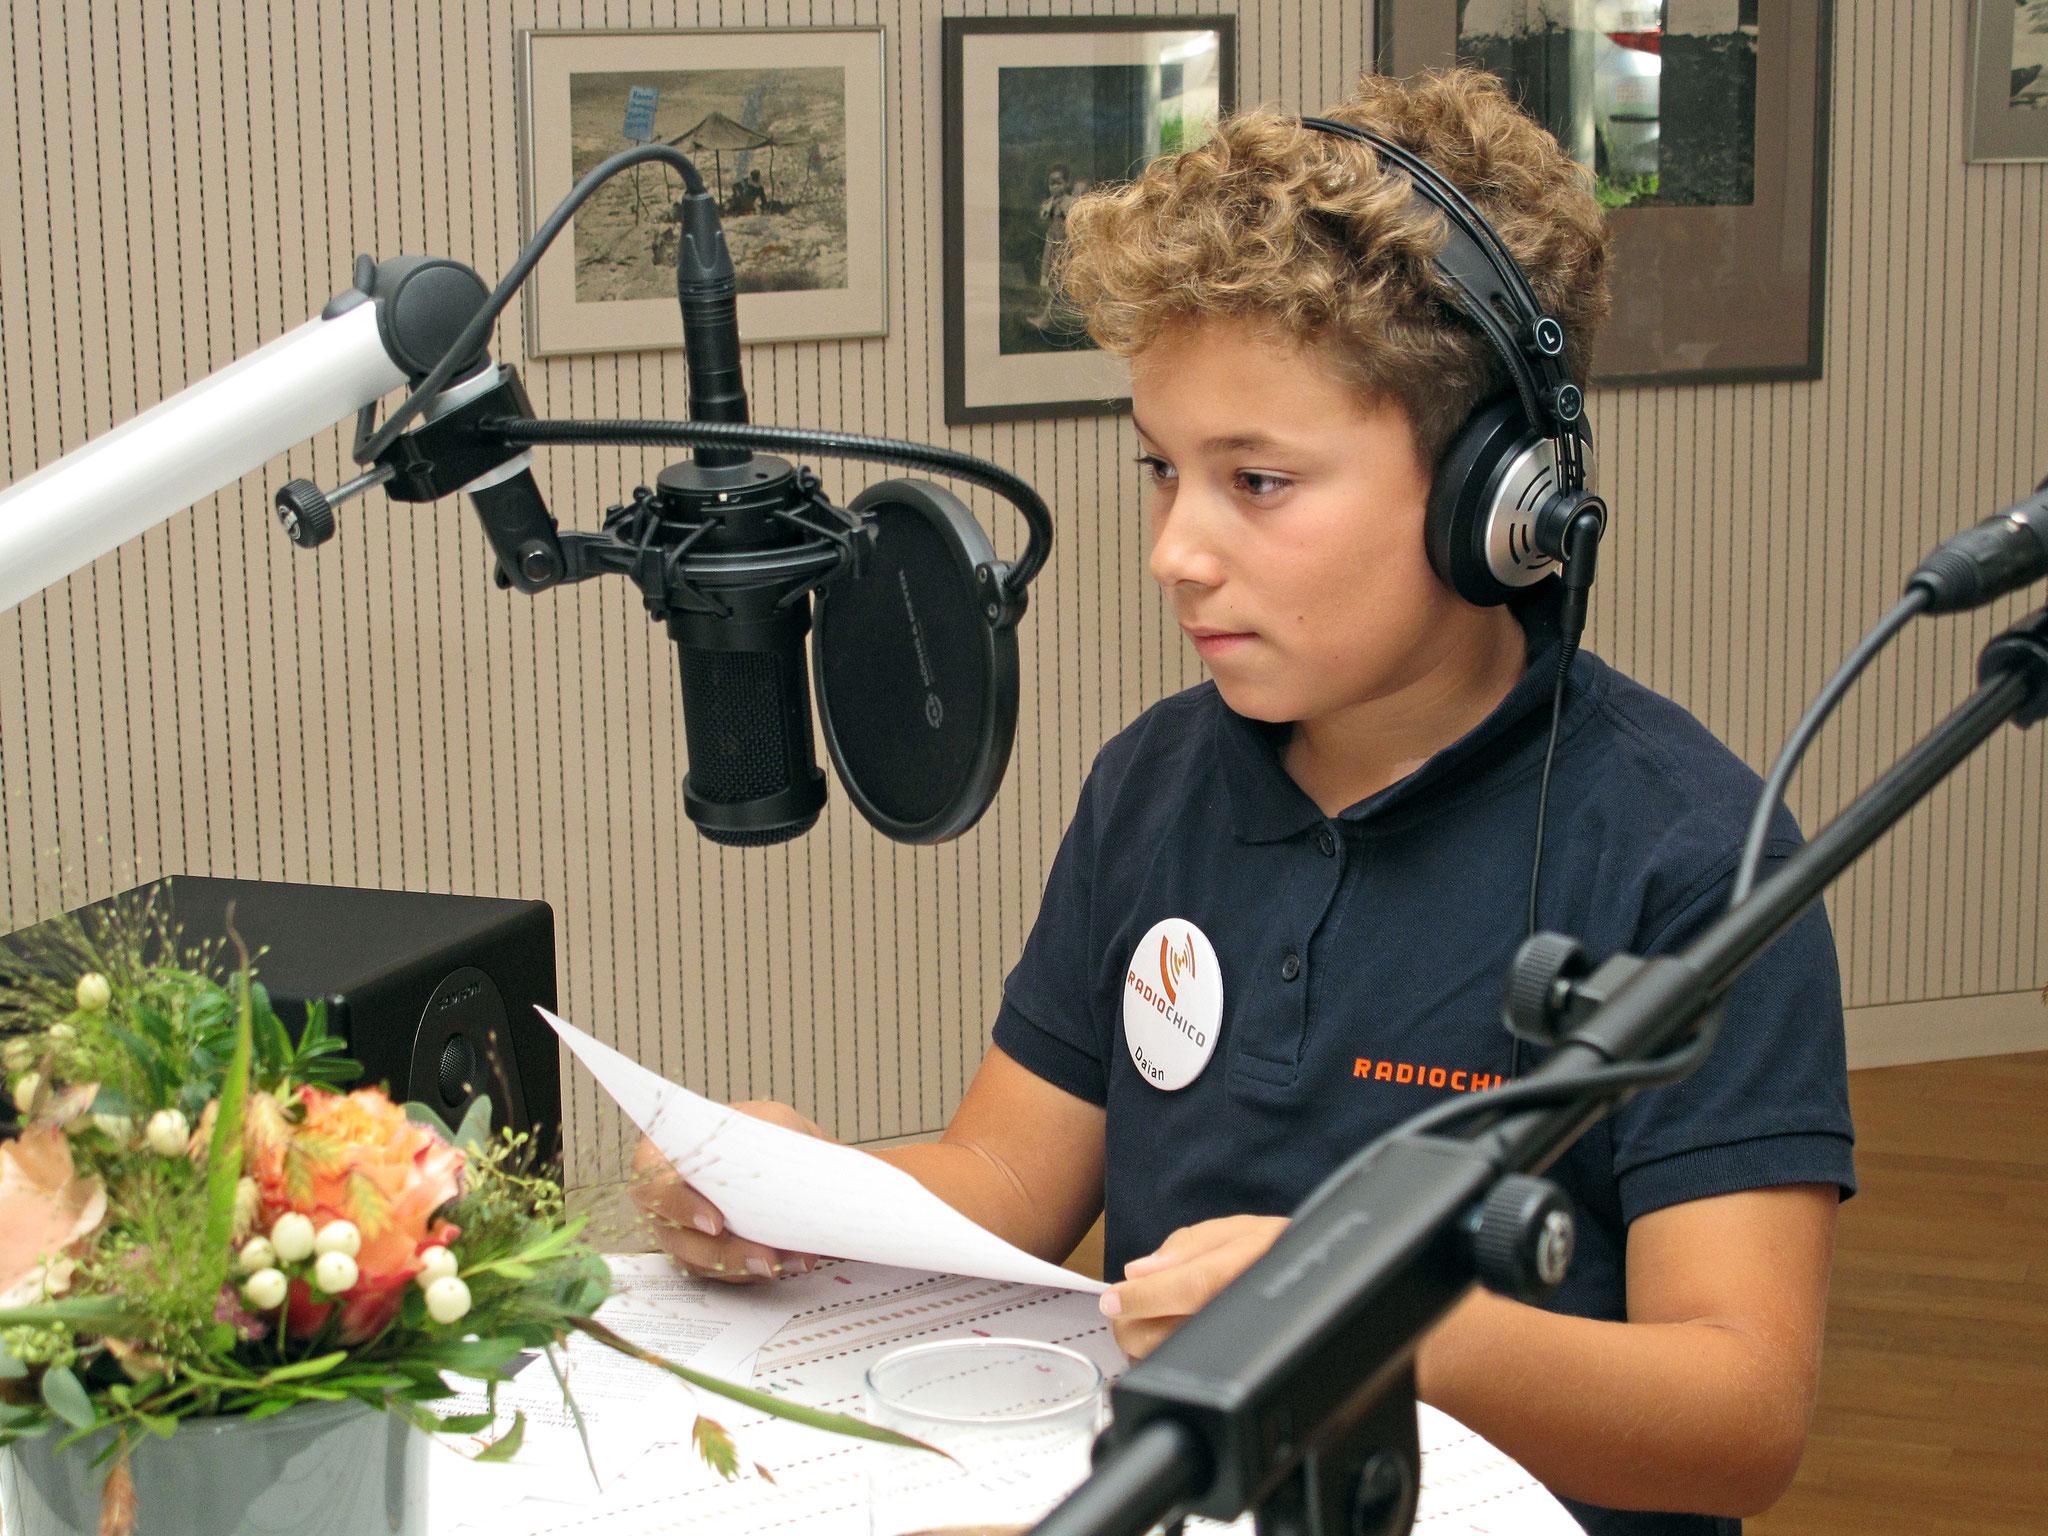 RadioChico Jugendmoderator Daïan